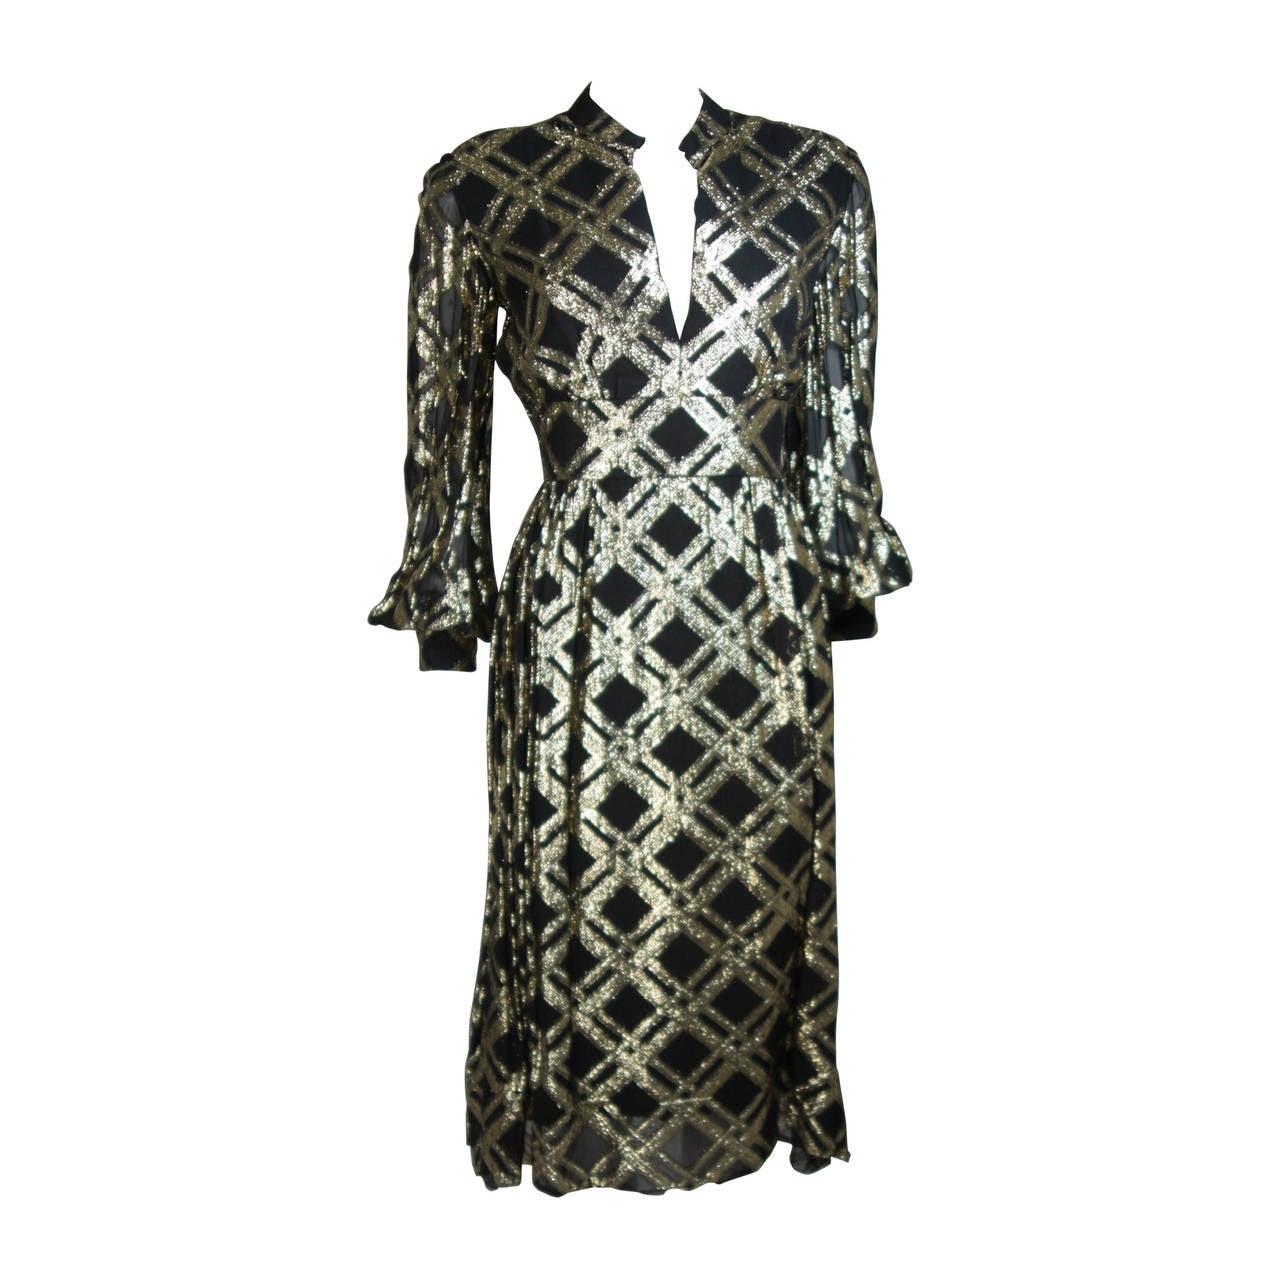 Ceil Chapman Black Silk and Gold Lame Cocktail Dress Size M 1